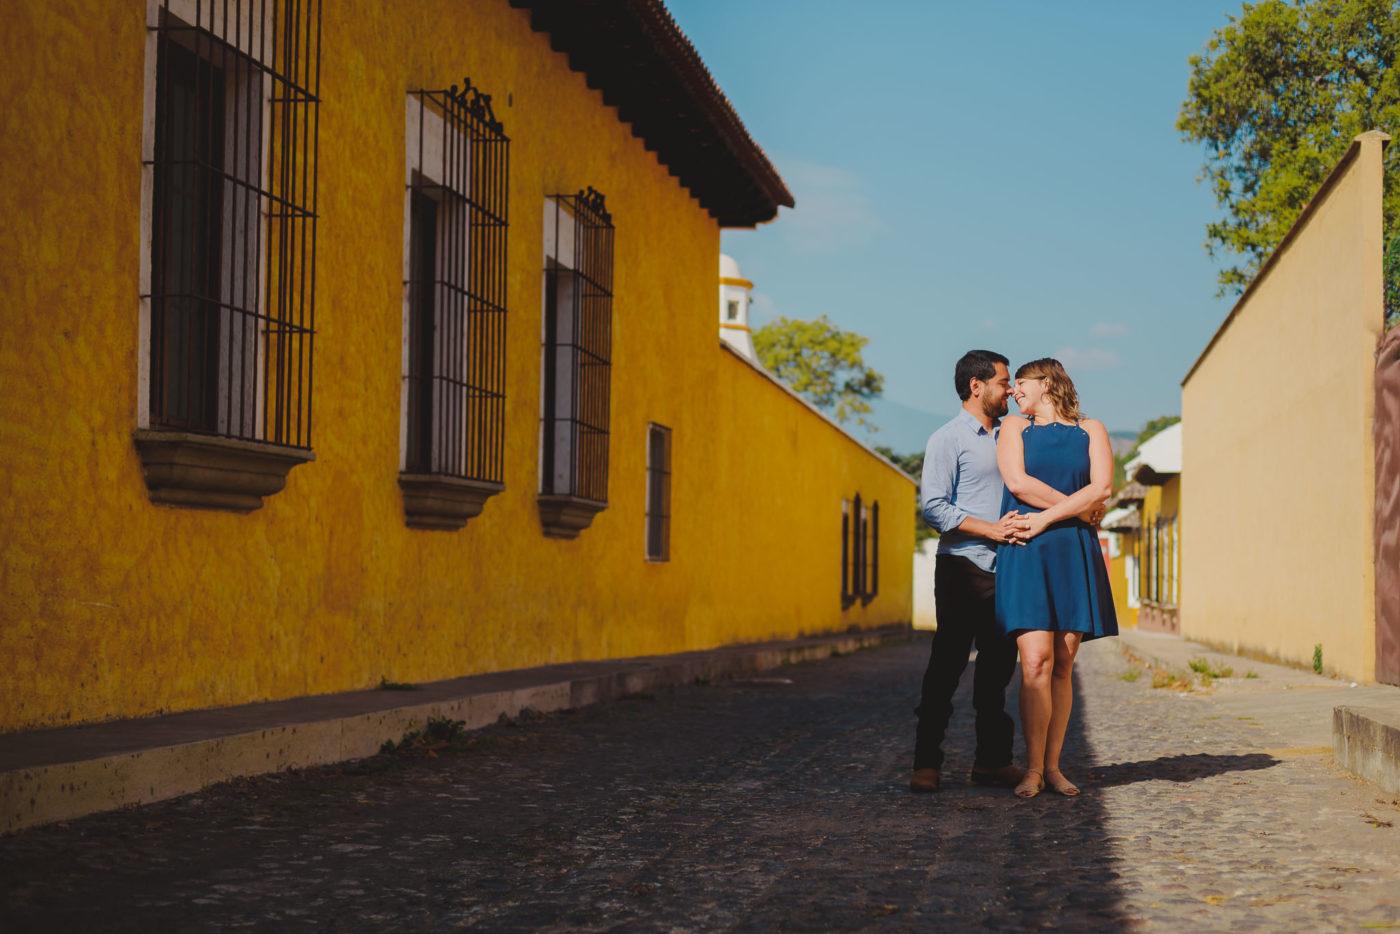 Compromiso-Oscar_Jessica-Pre-boda-engagement-photoshoot-couple-pareja-Bodas_Juan_Salazar-juansalazarphoto-Antigua_Guatemala-Destination_wedding